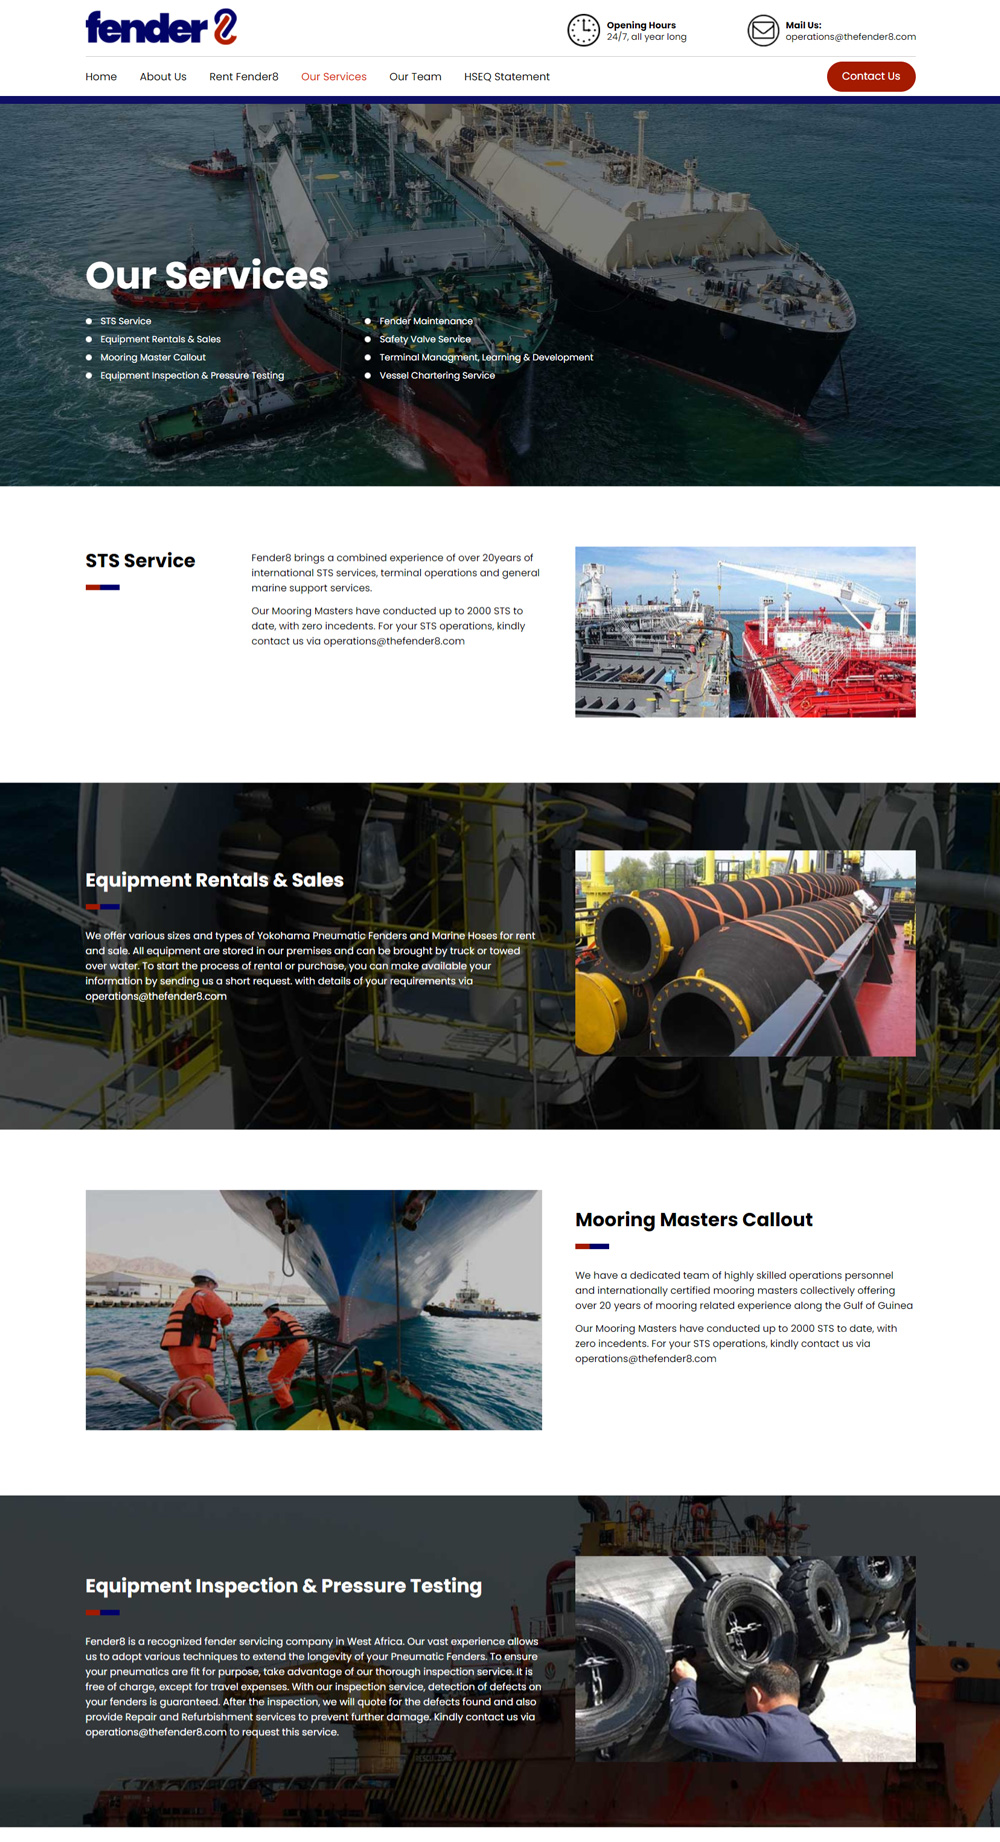 marine service company website redesign for fender8